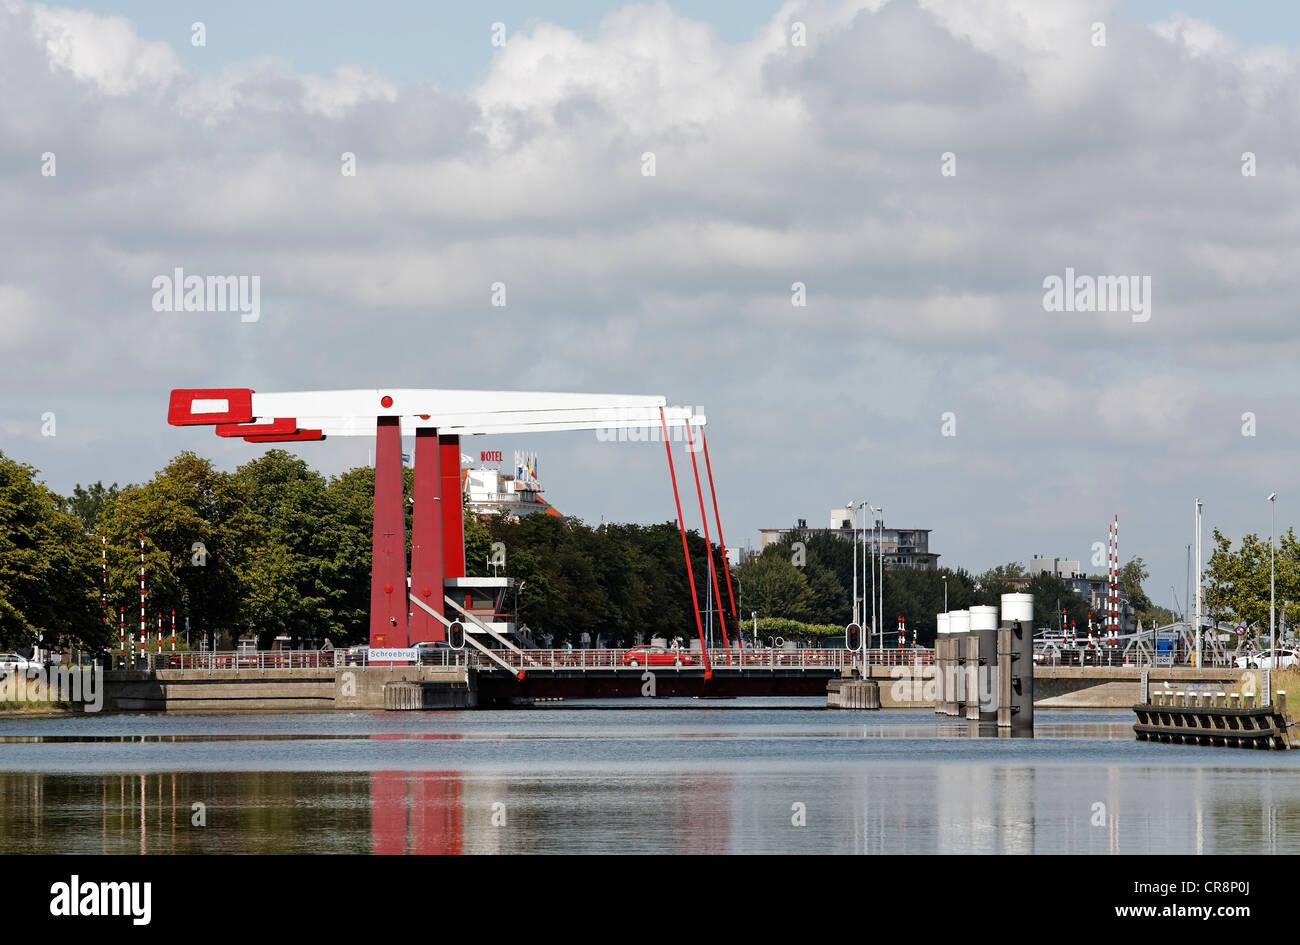 Schroebrug modern bascule bridge over the canal through Walcheren, Middelburg, Zeeland, Netherlands, Europe Stock Photo